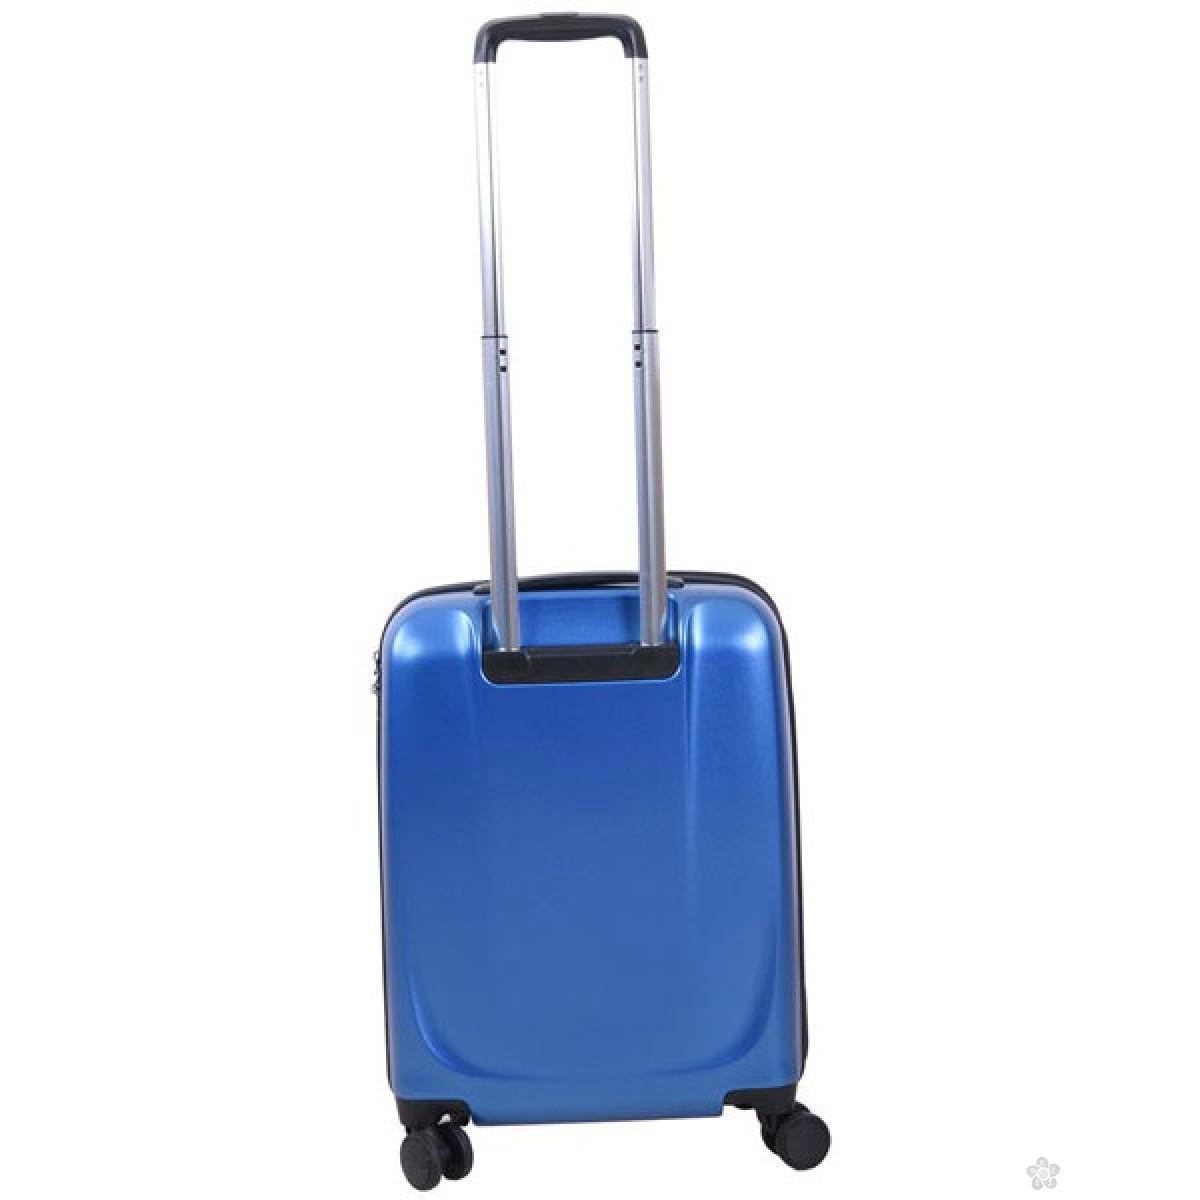 Kofer Pulse Manhattan tamno plavi 20inch X21157